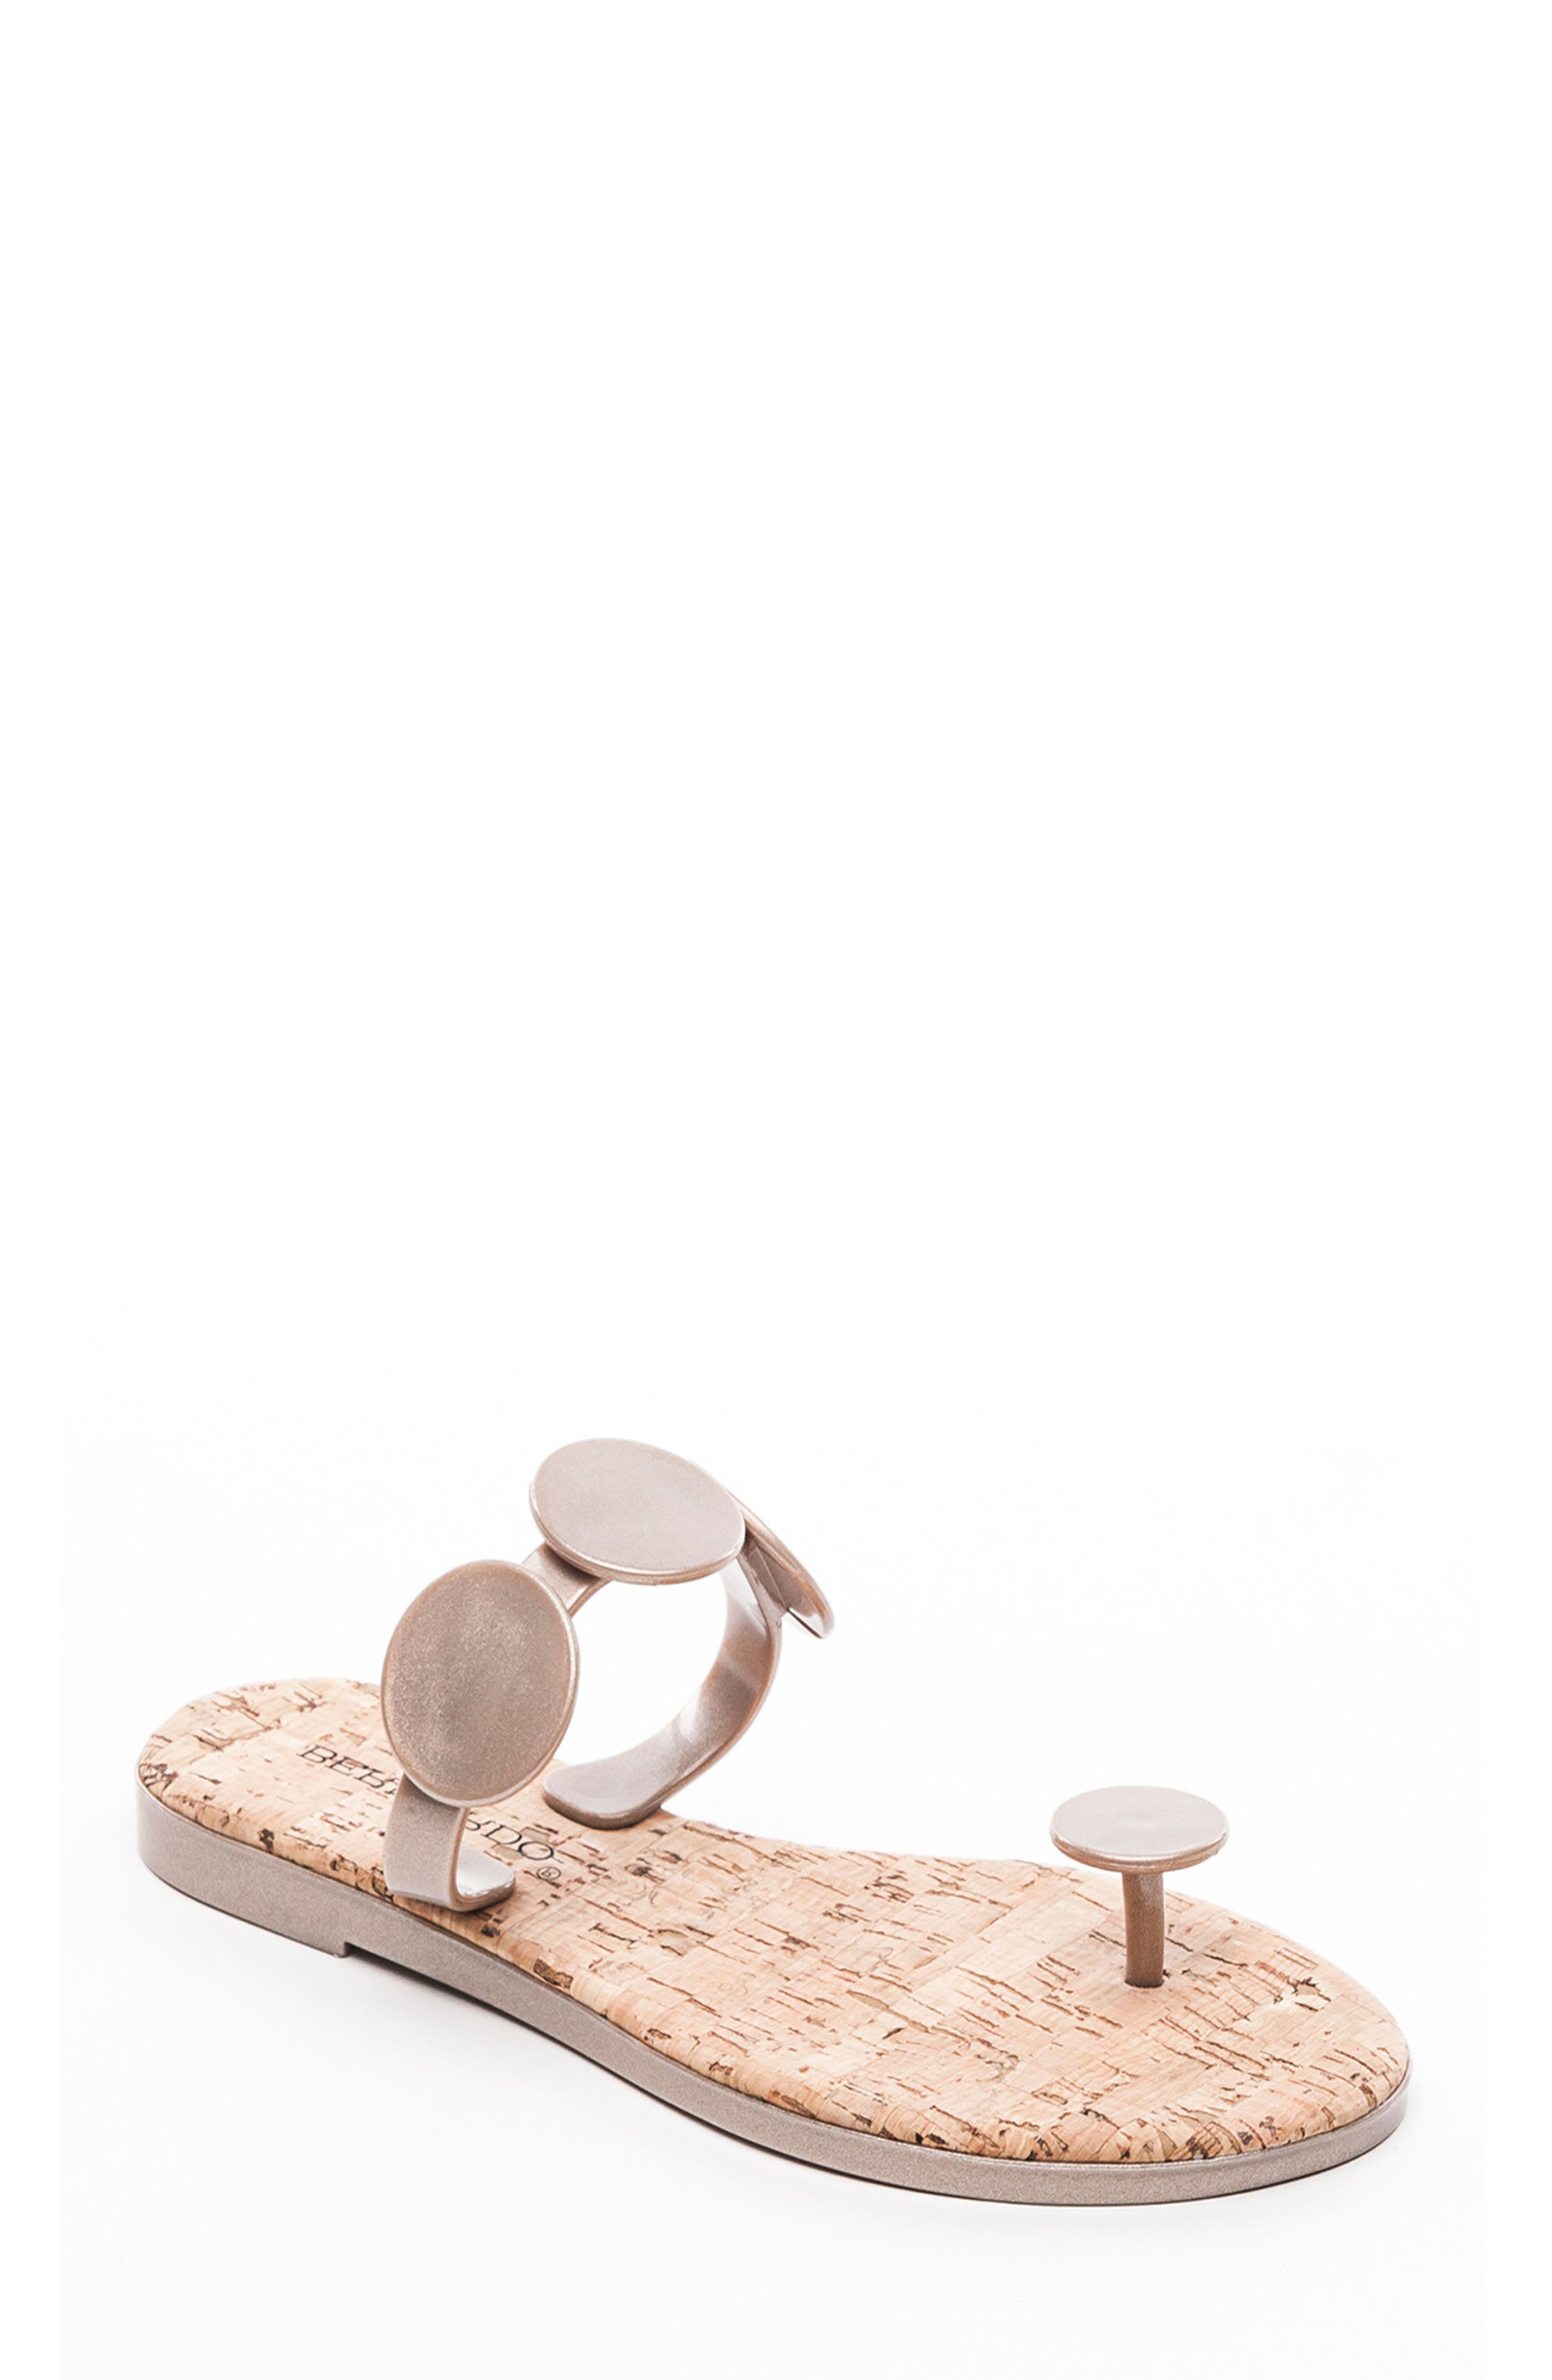 36b82f316 bernardo sandals